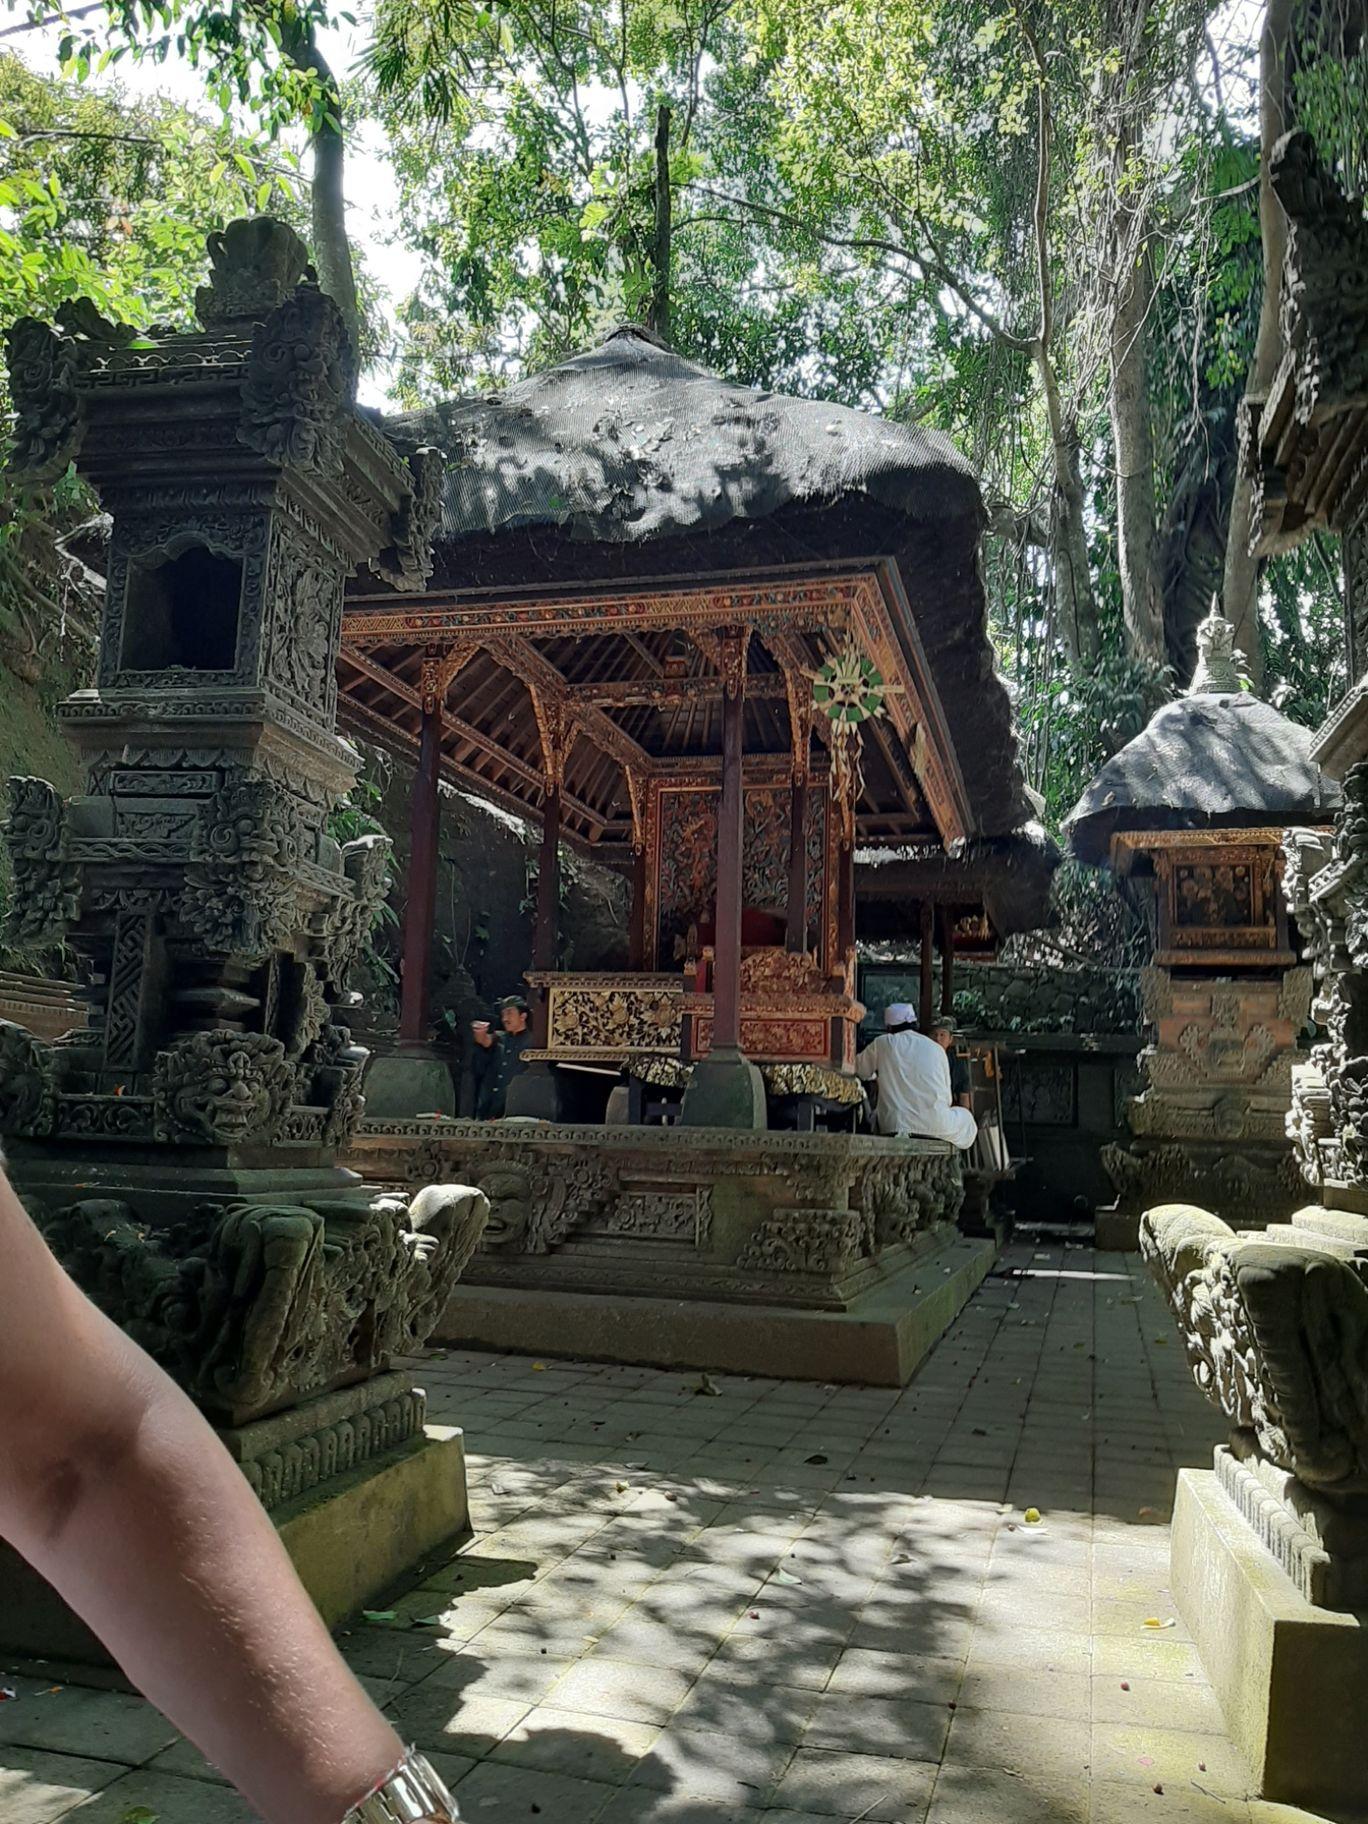 Photo of Bali By Dhwanil Shah